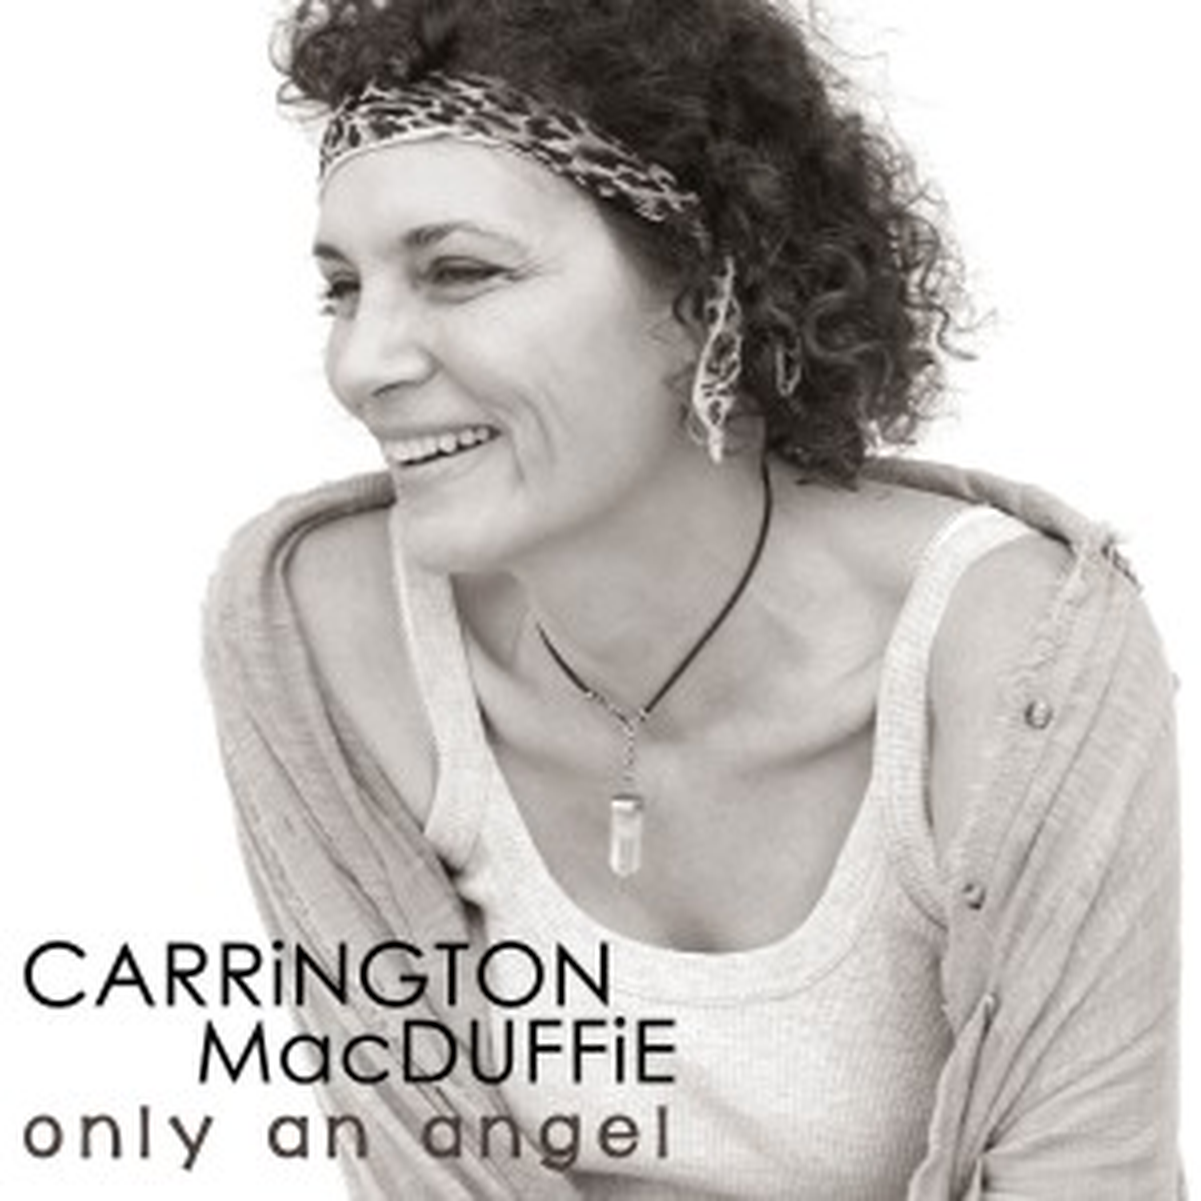 CARRiNGTON MacDUFFiE wiki, CARRiNGTON MacDUFFiE review, CARRiNGTON MacDUFFiE history, CARRiNGTON MacDUFFiE news